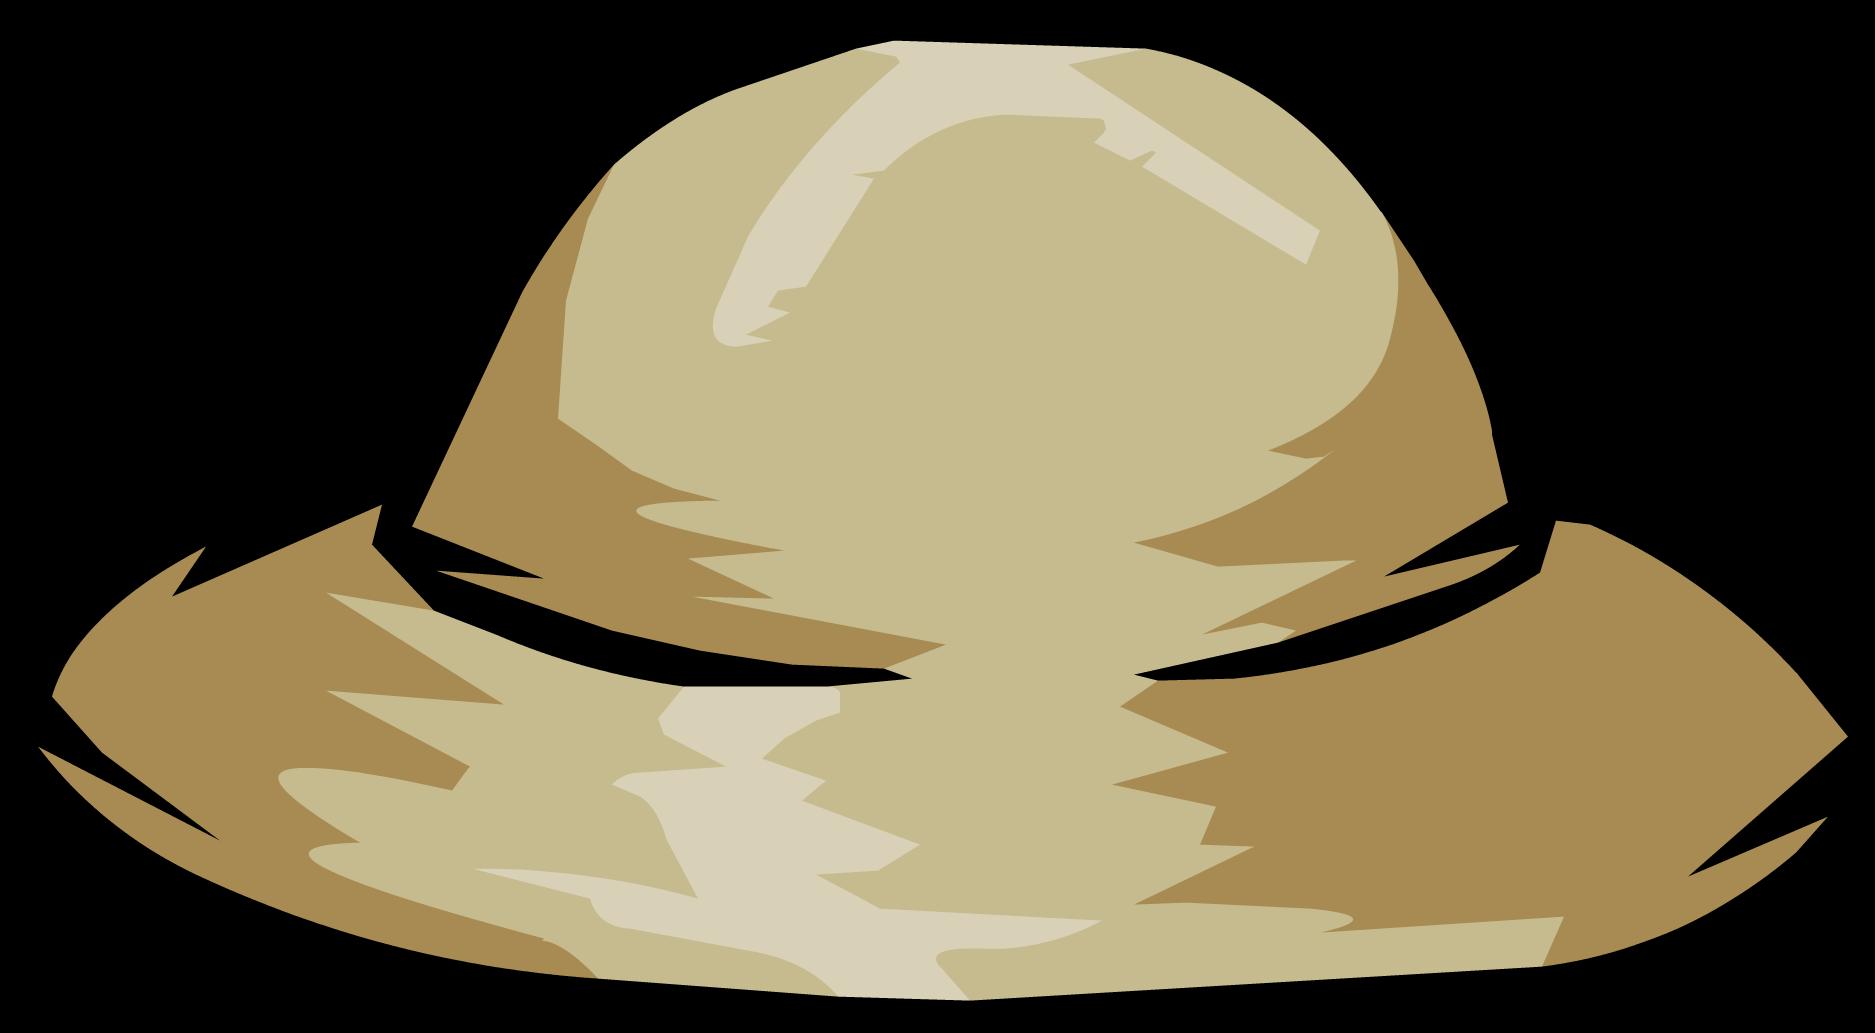 Clipart penguin computer. Image safari hat clothing